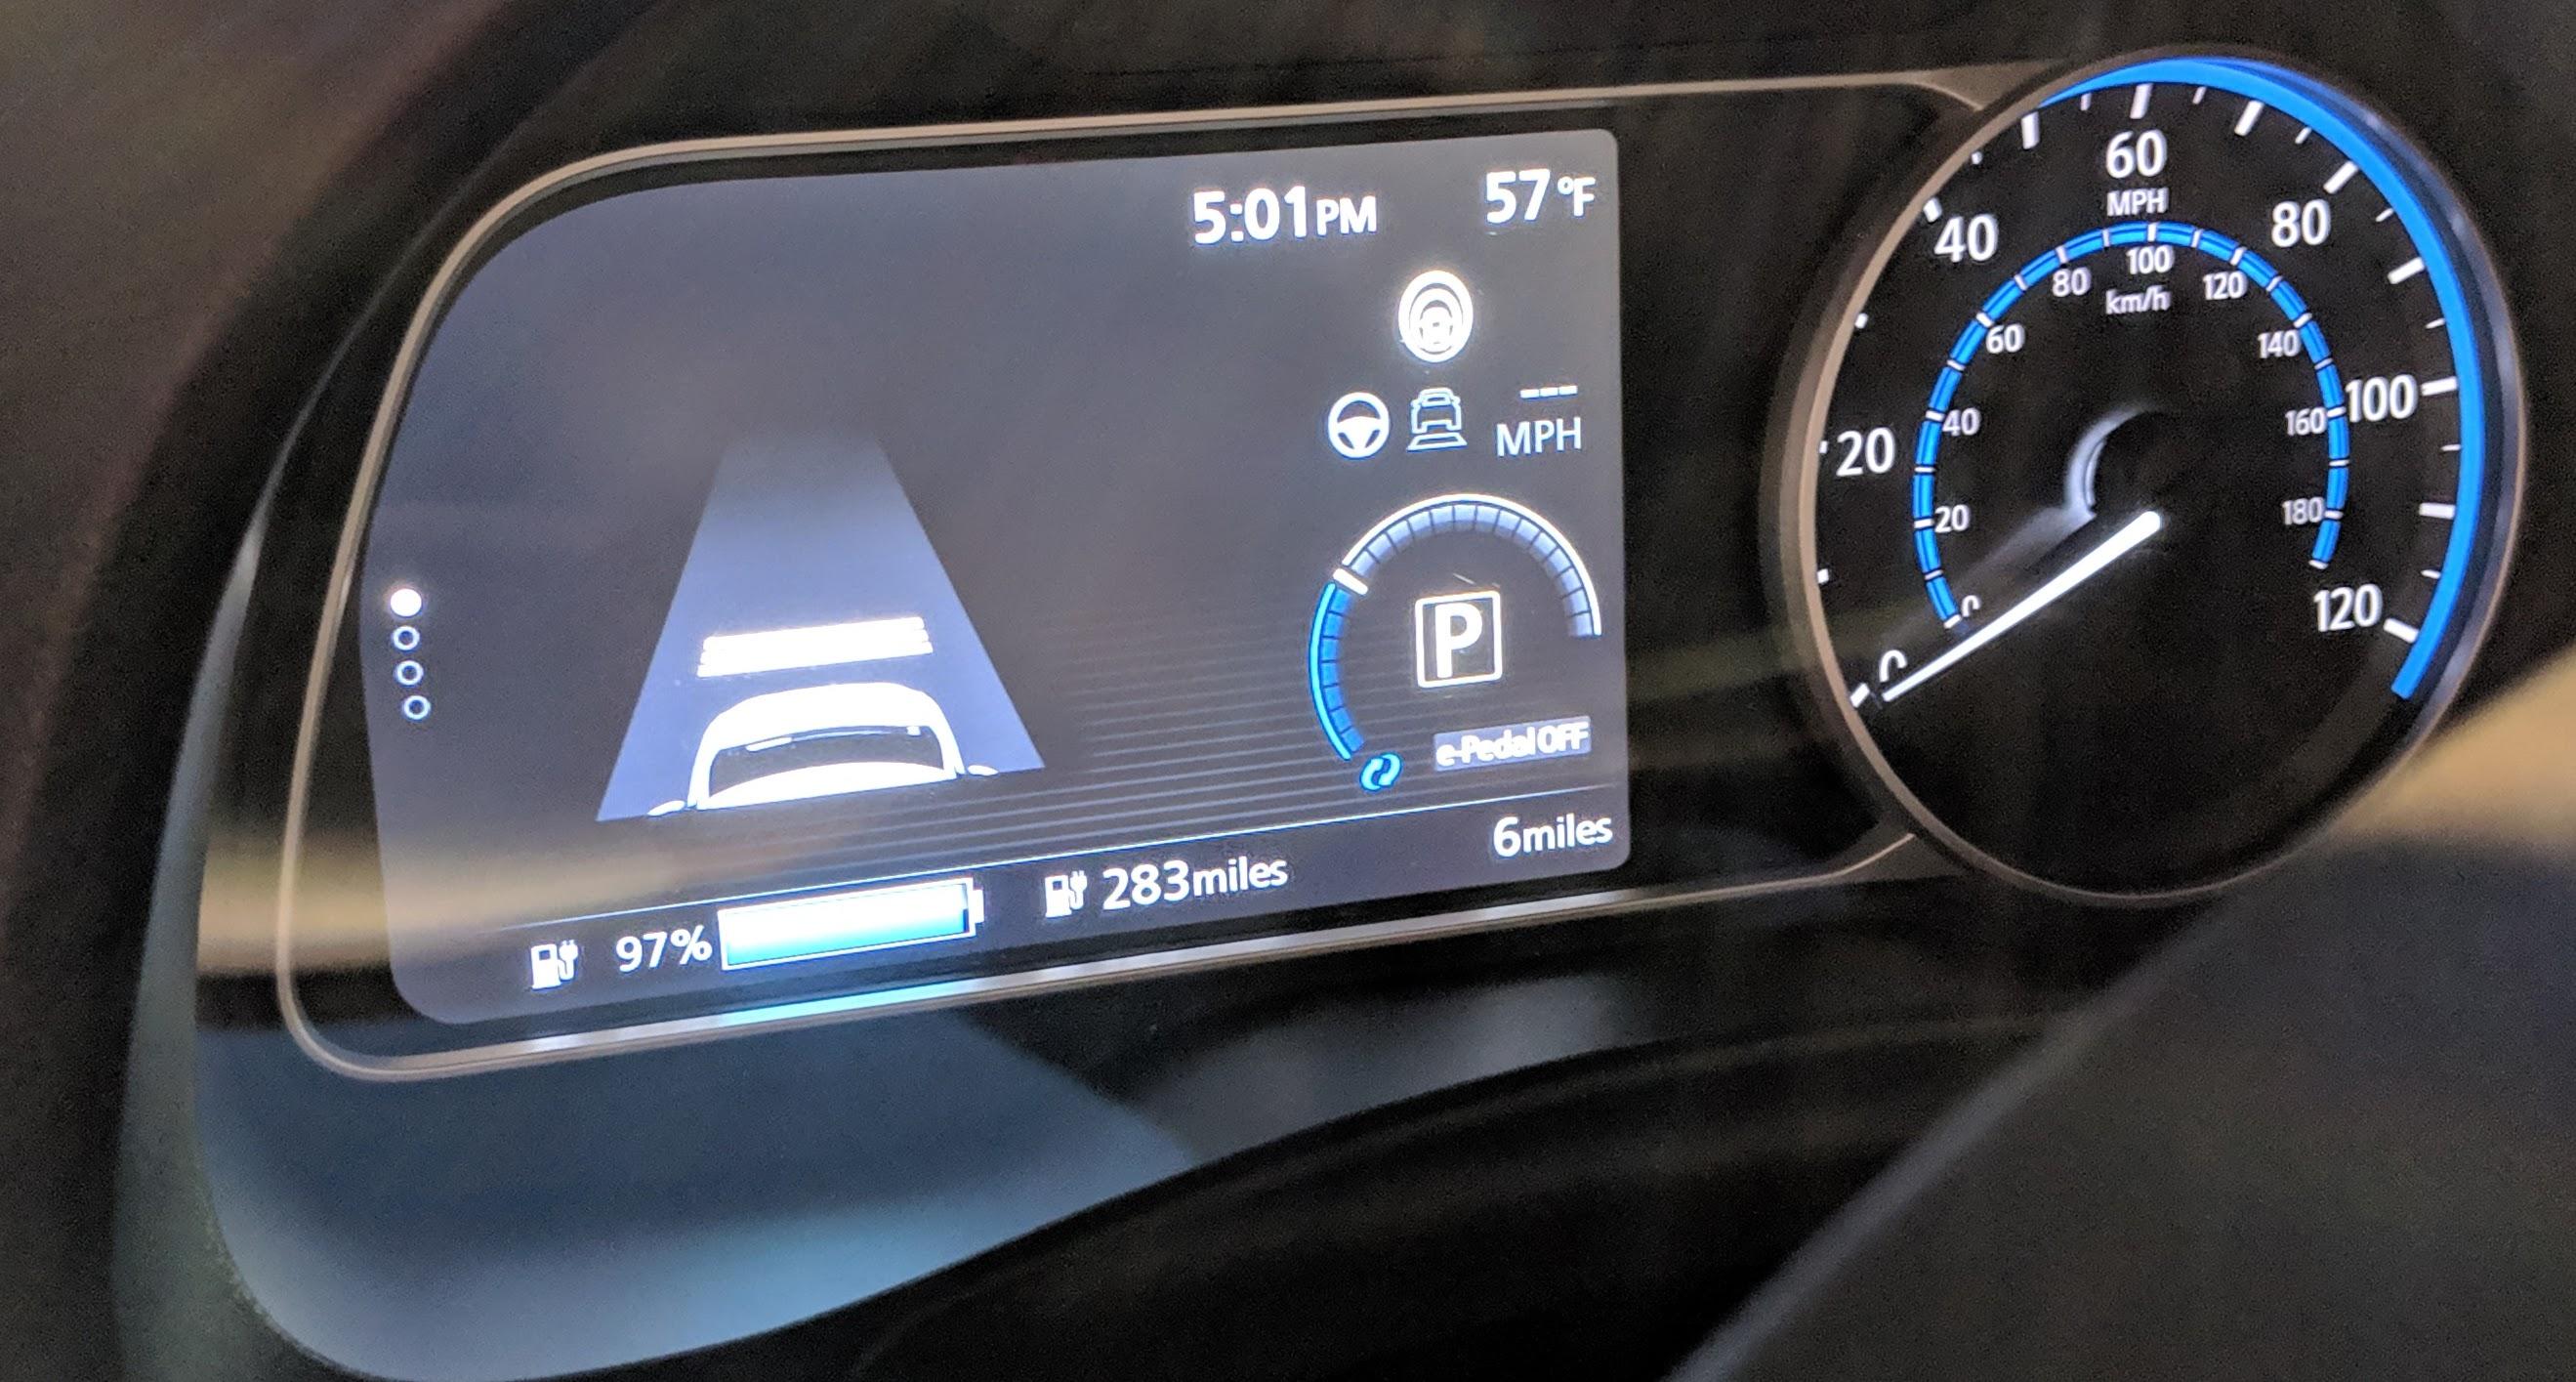 Nissan Leaf Plus Is A Speedy 214hp Hatchback W226 Mile Range Hits